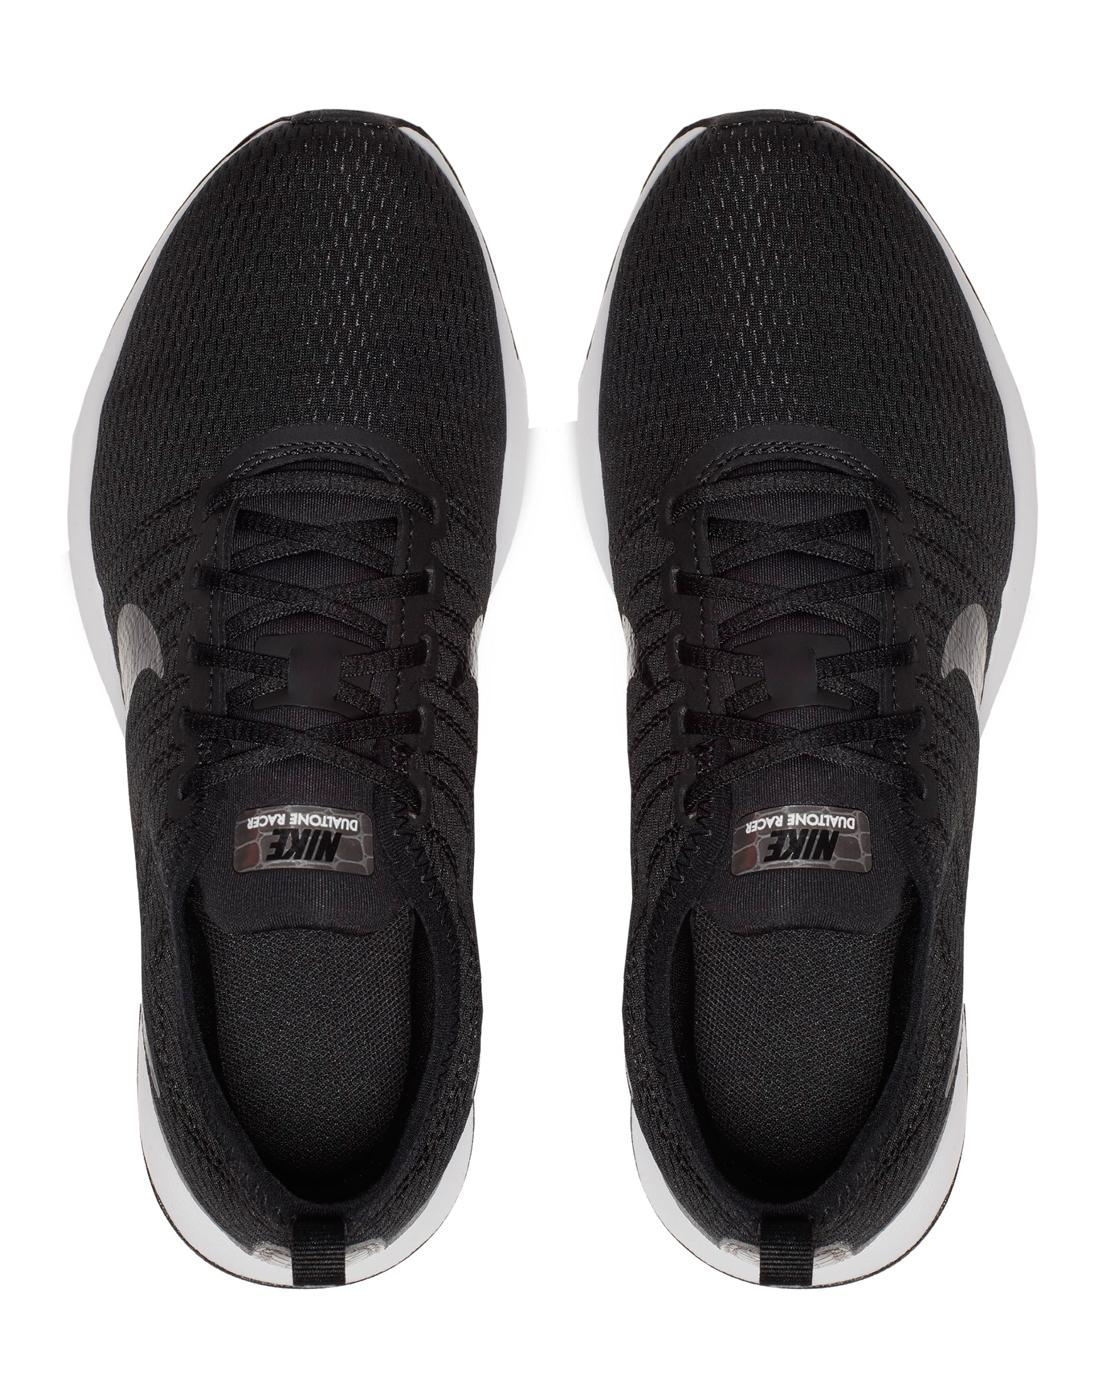 bb36d58f6 Nike Older Kids Dualtone Racer | Life Style Sports